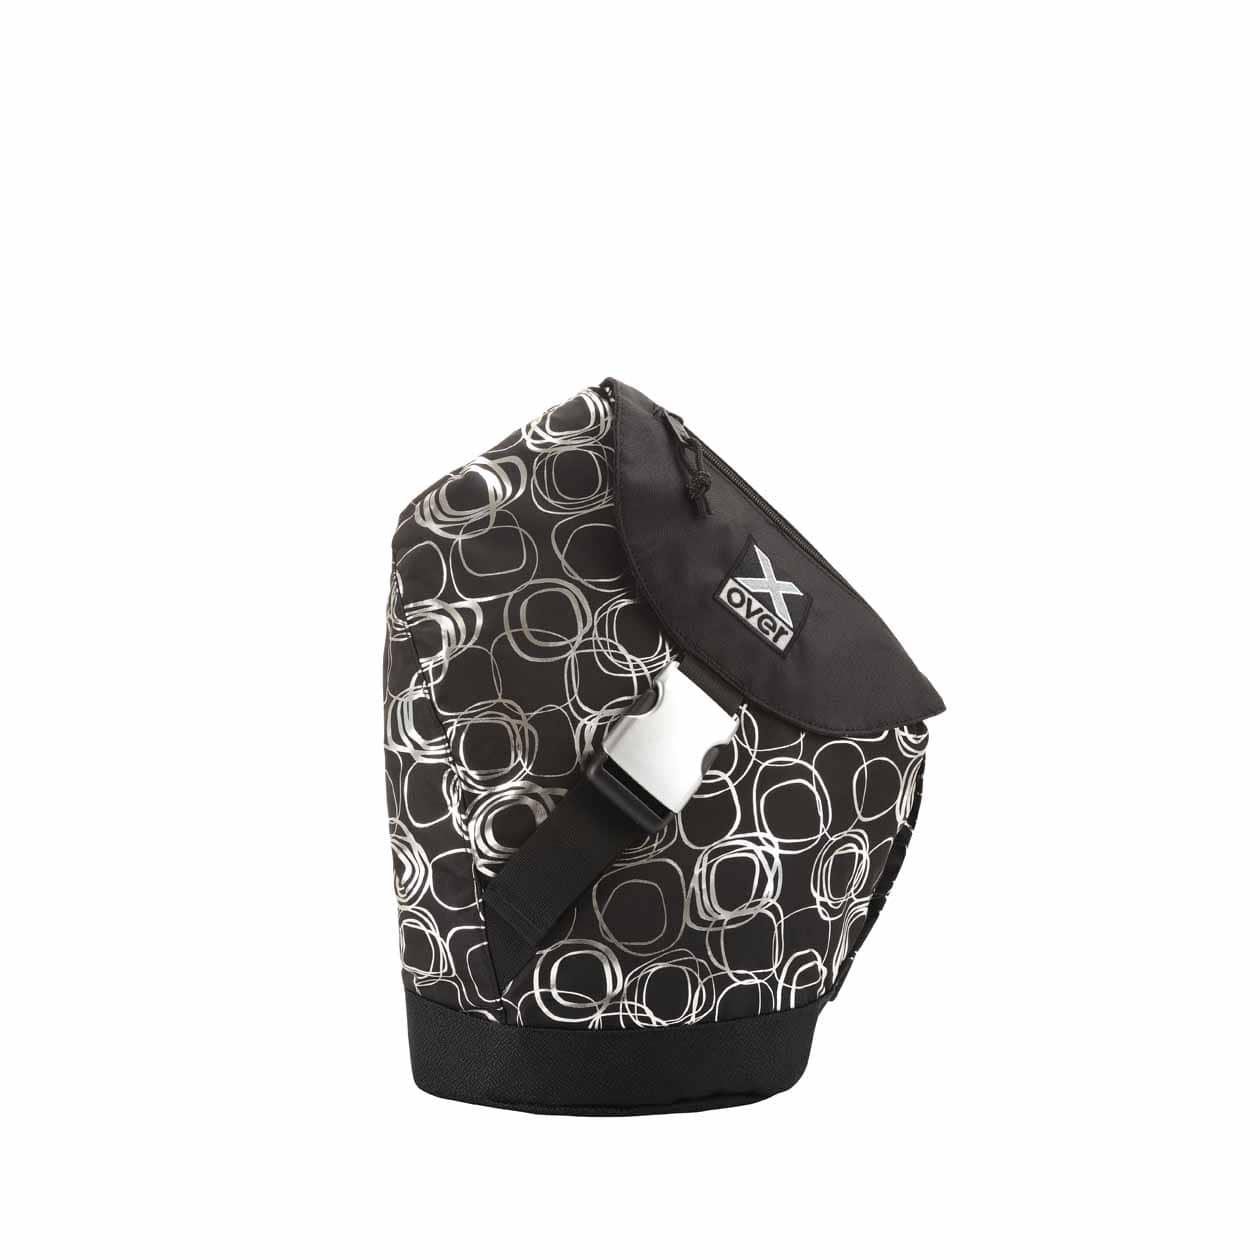 x-over schuine rugzak original en vogue silver blackness small